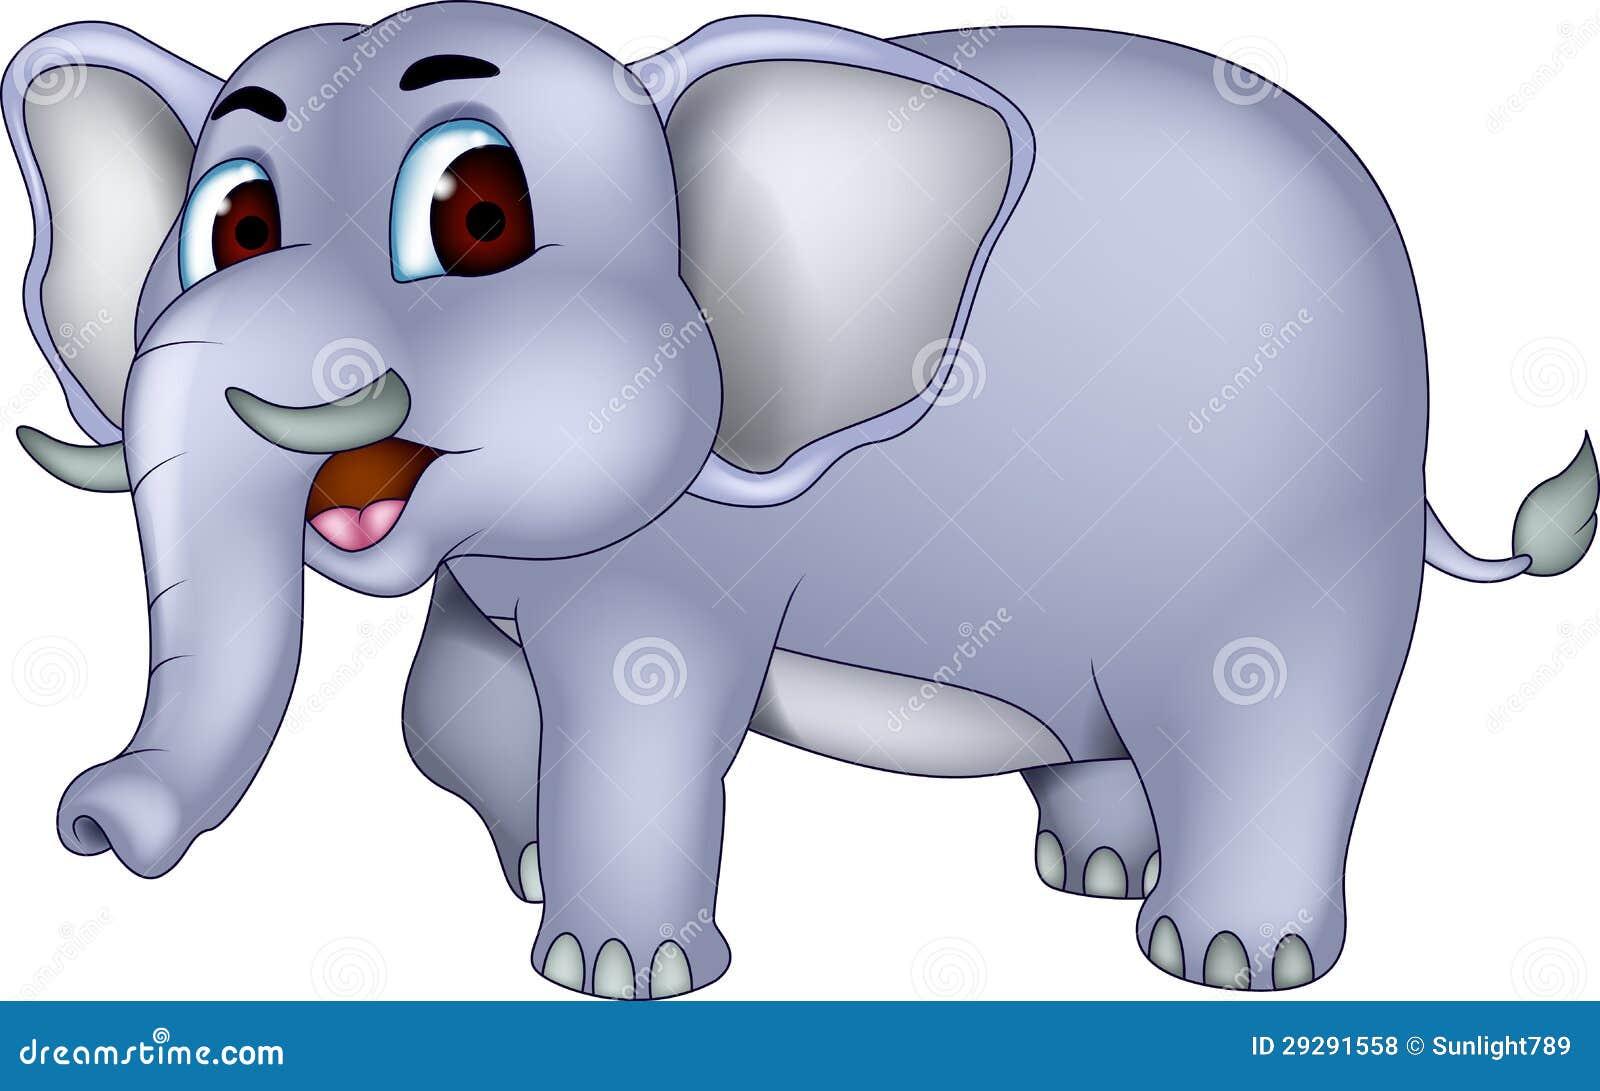 Cute elephant cartoon stock illustration. Illustration of ...